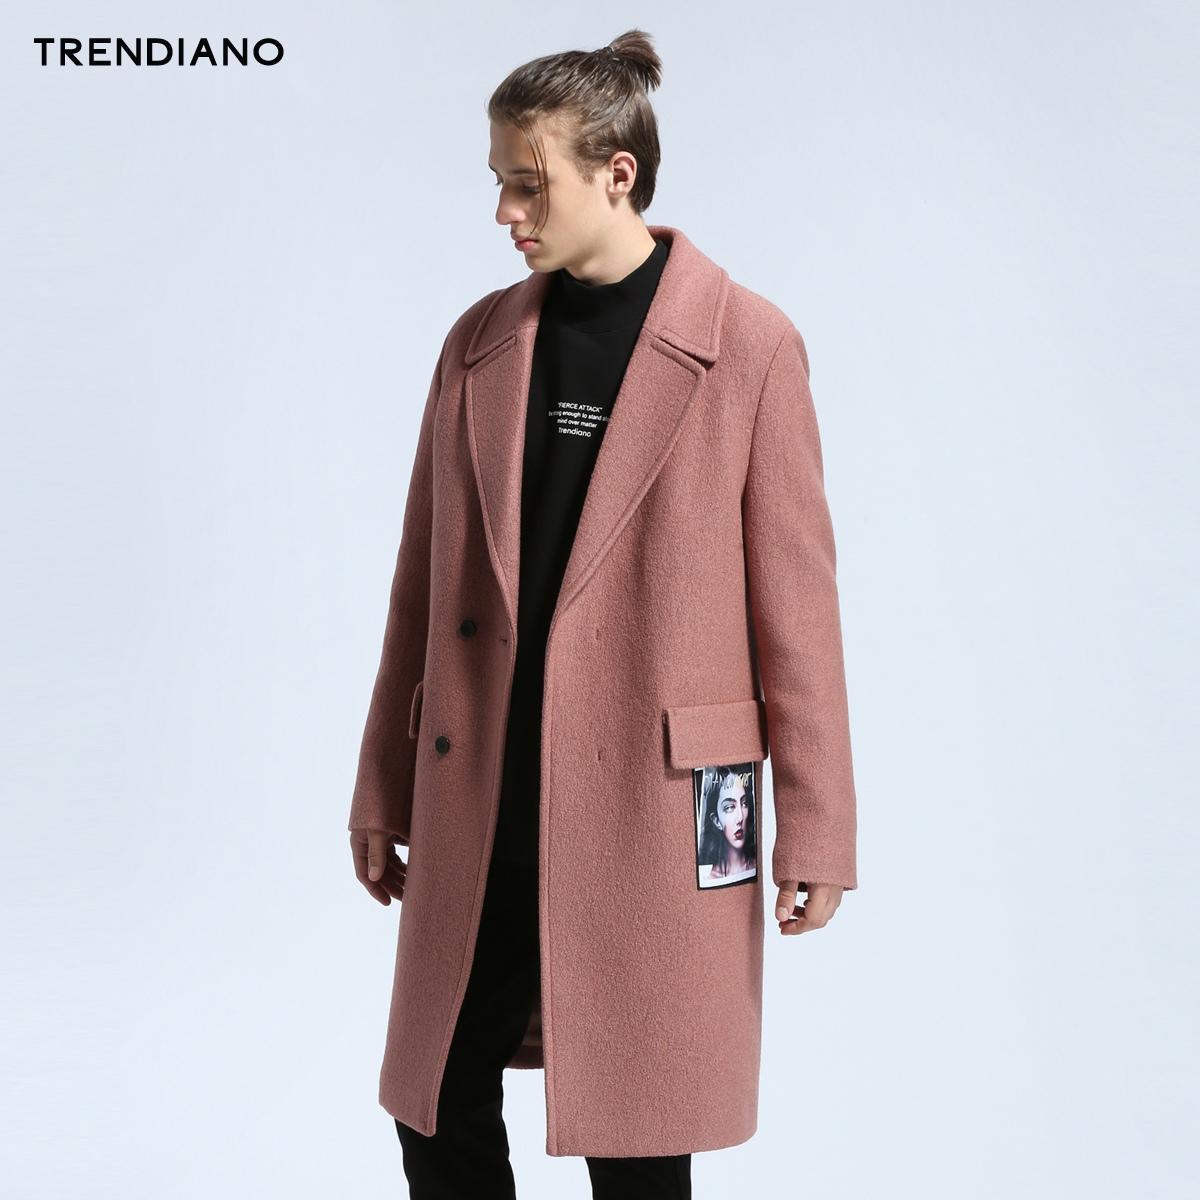 TRENDIANO新男装冬装西装式人像贴布长款毛呢外套大衣3JC4340570